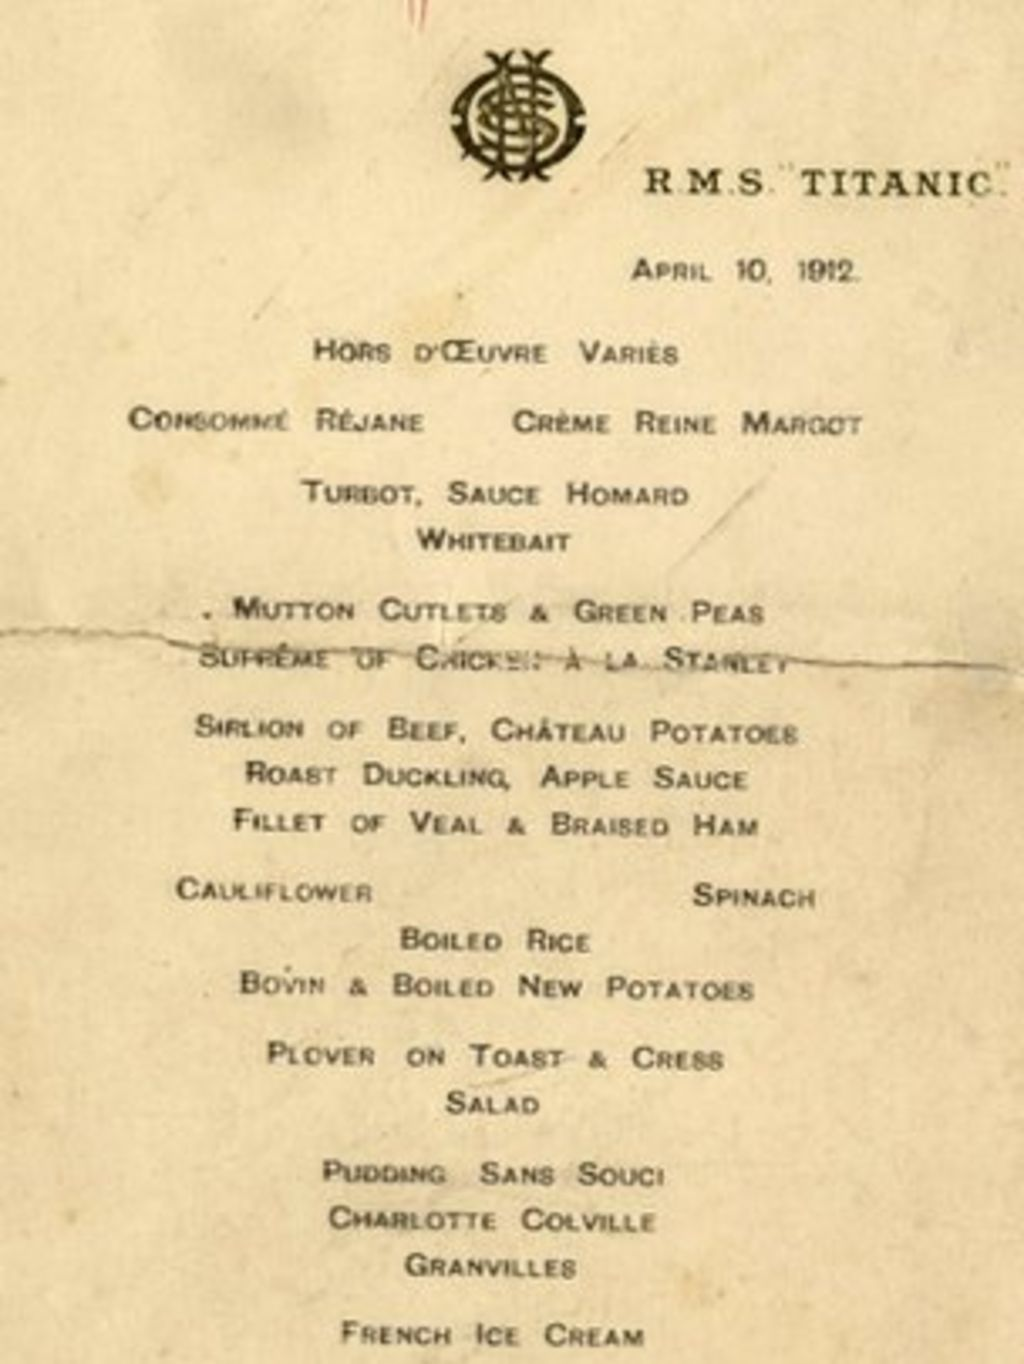 Titanic menu sells for £46,000 at auction - BBC News